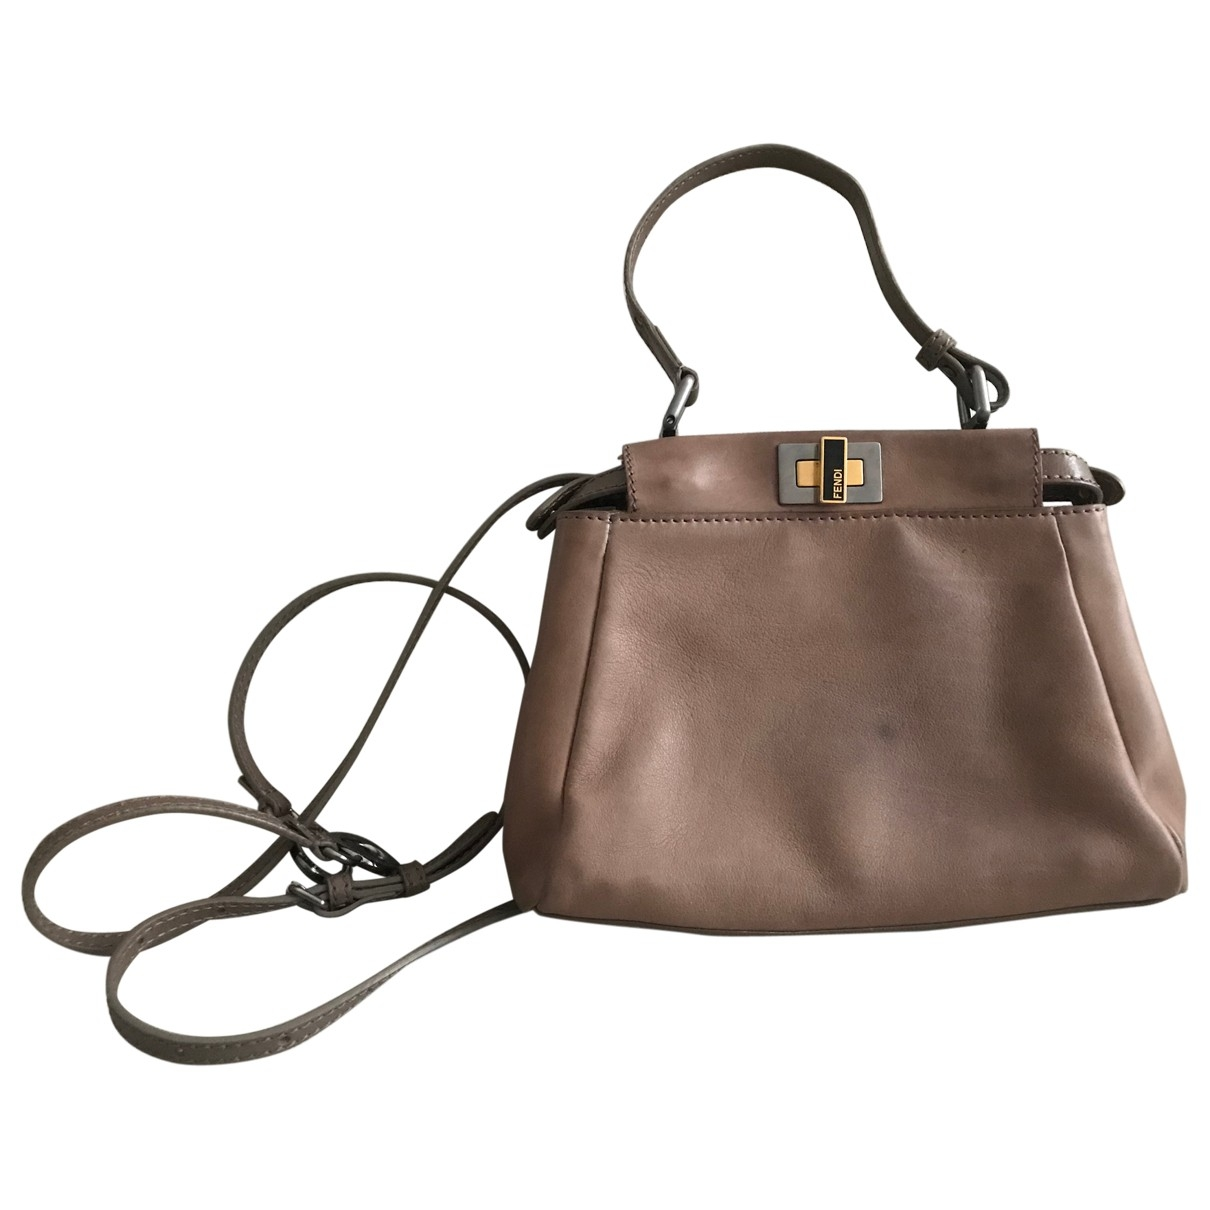 Fendi Peekaboo Handtasche in  Kamel Leder